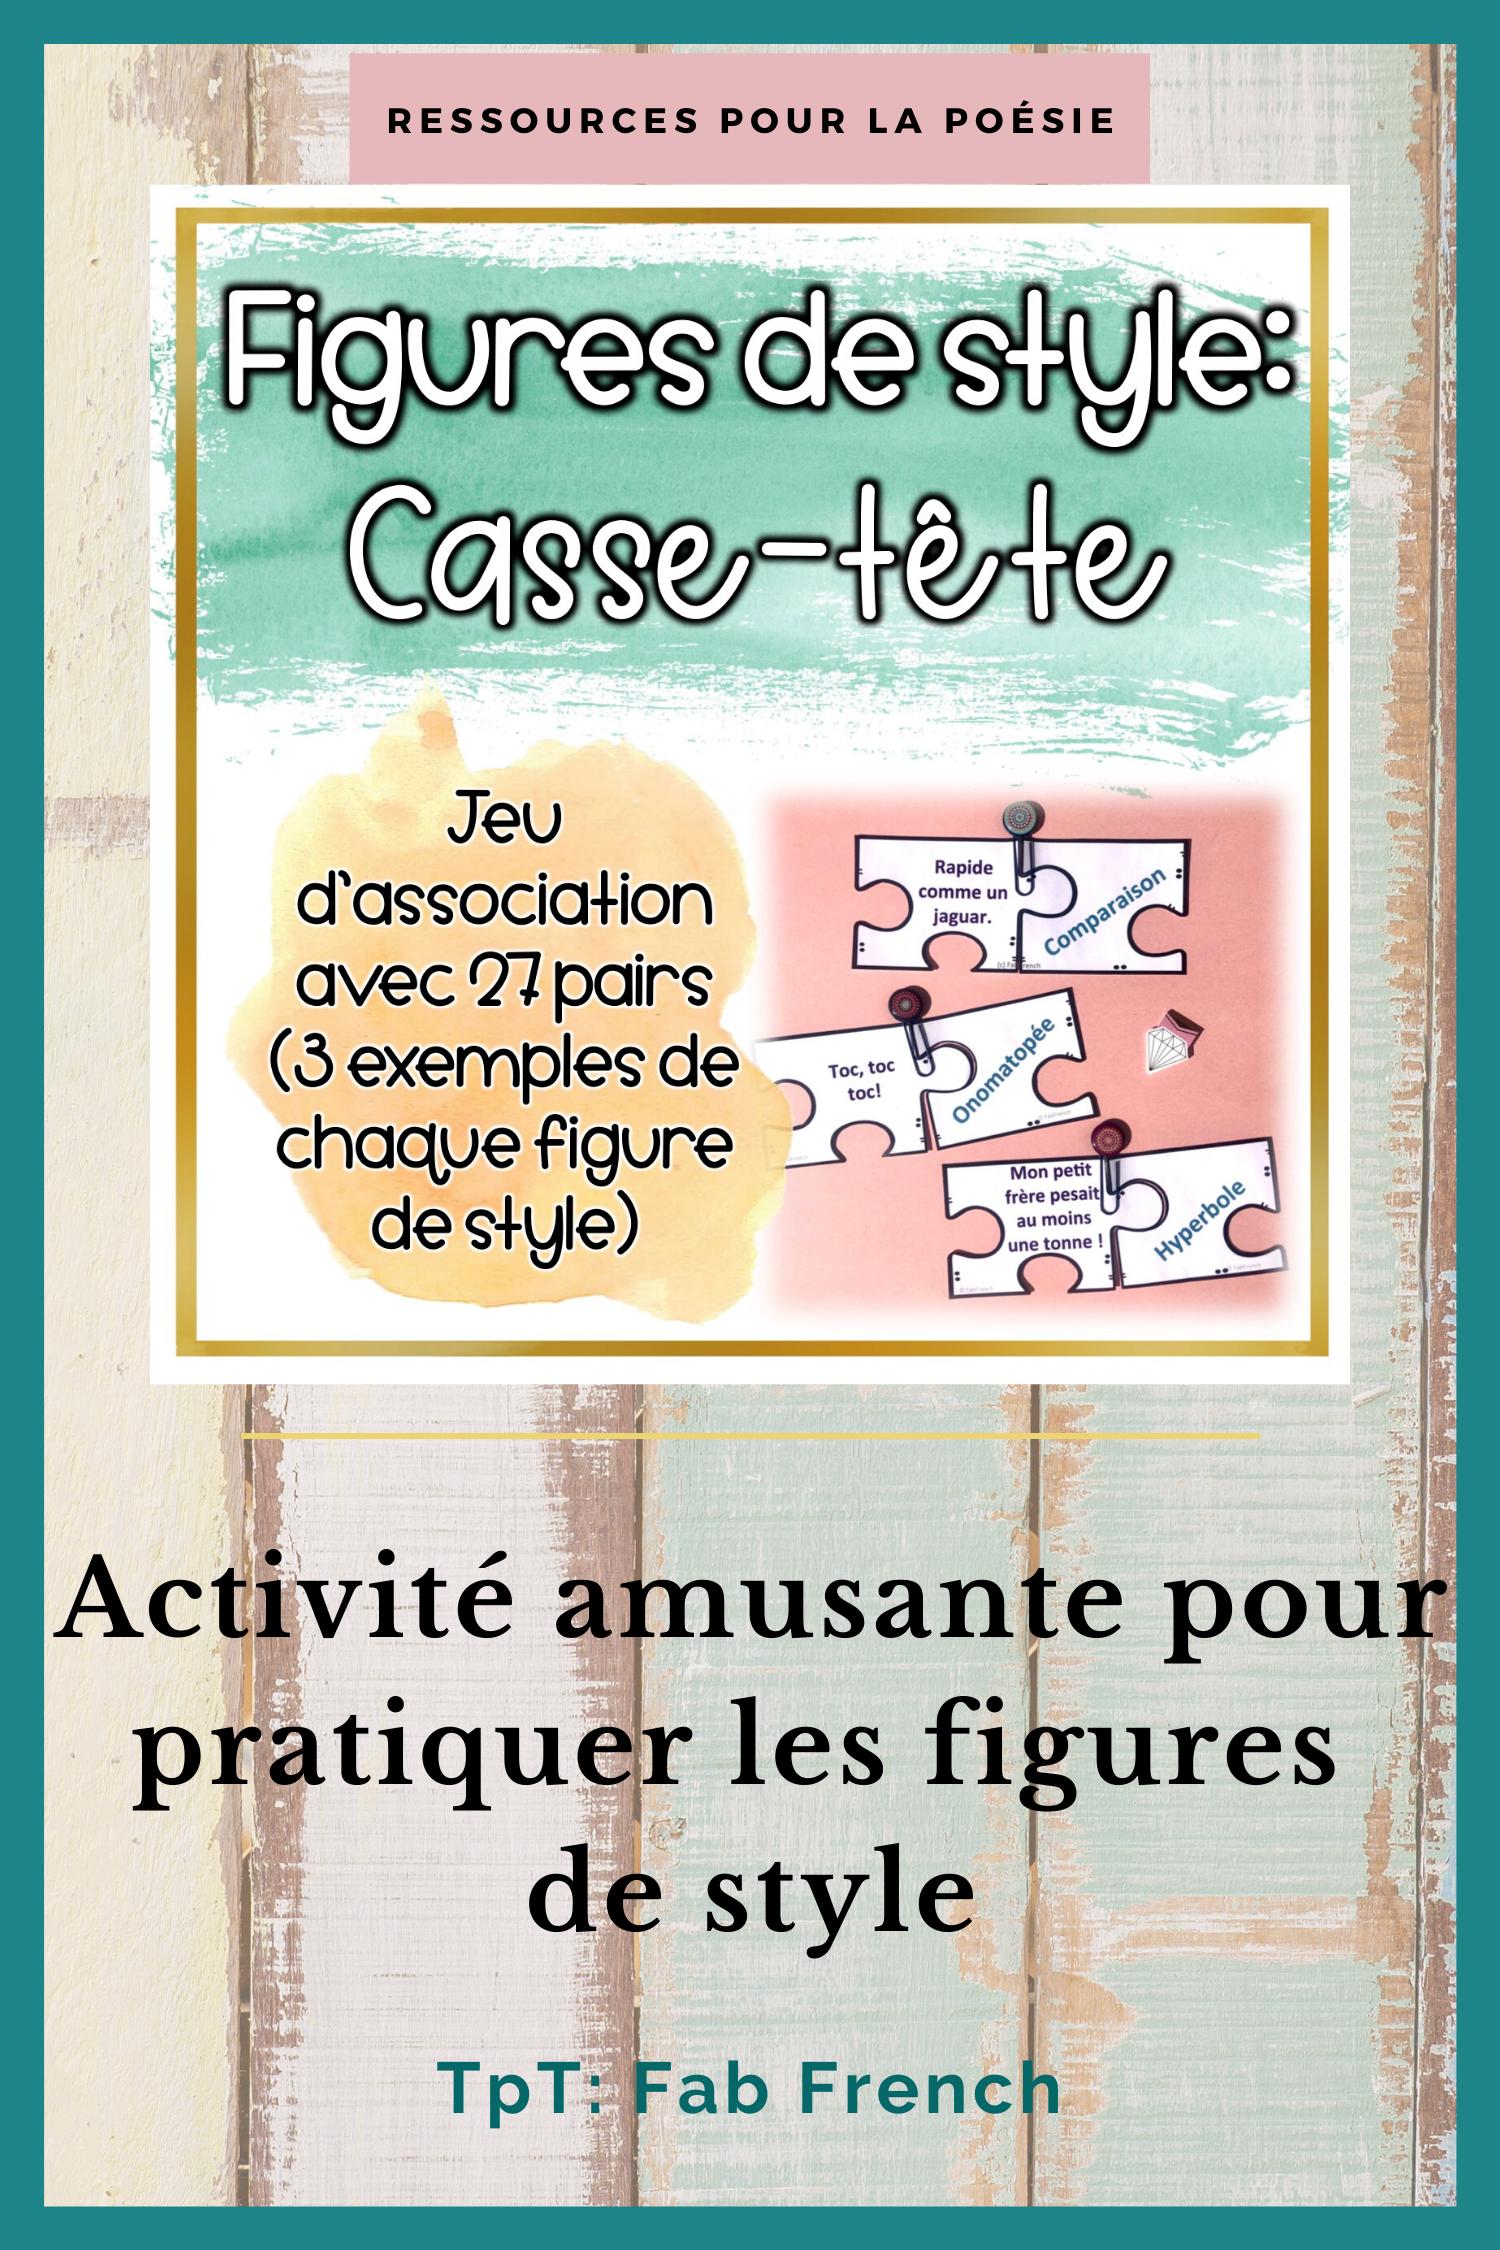 La poésie: Figures de style - Casse-Tête in 2020 ...